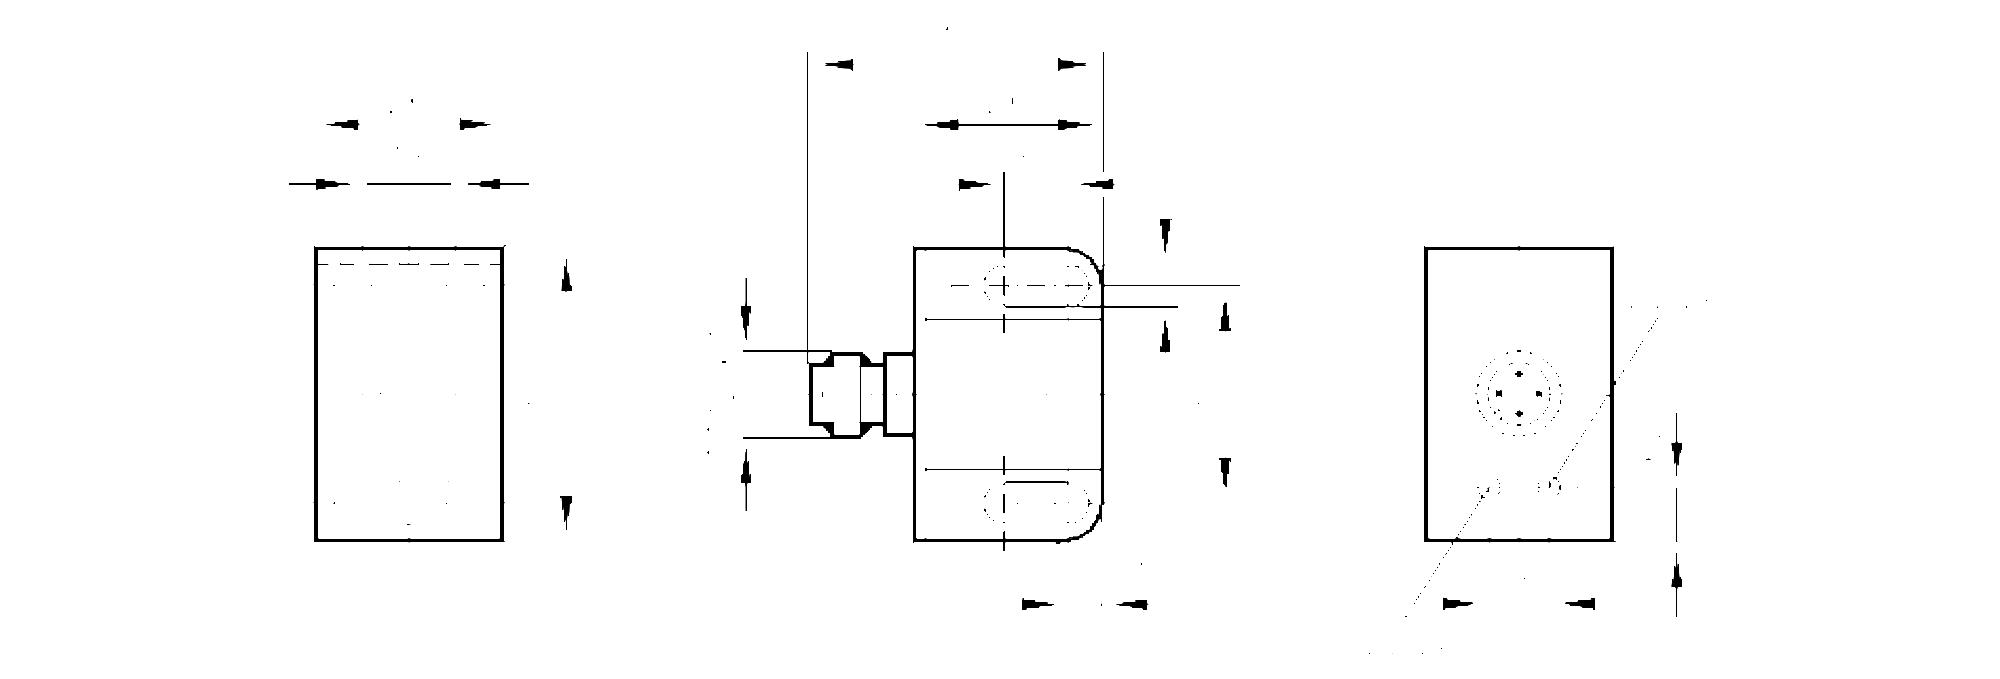 in5225 - dual inductive sensor for valve actuators